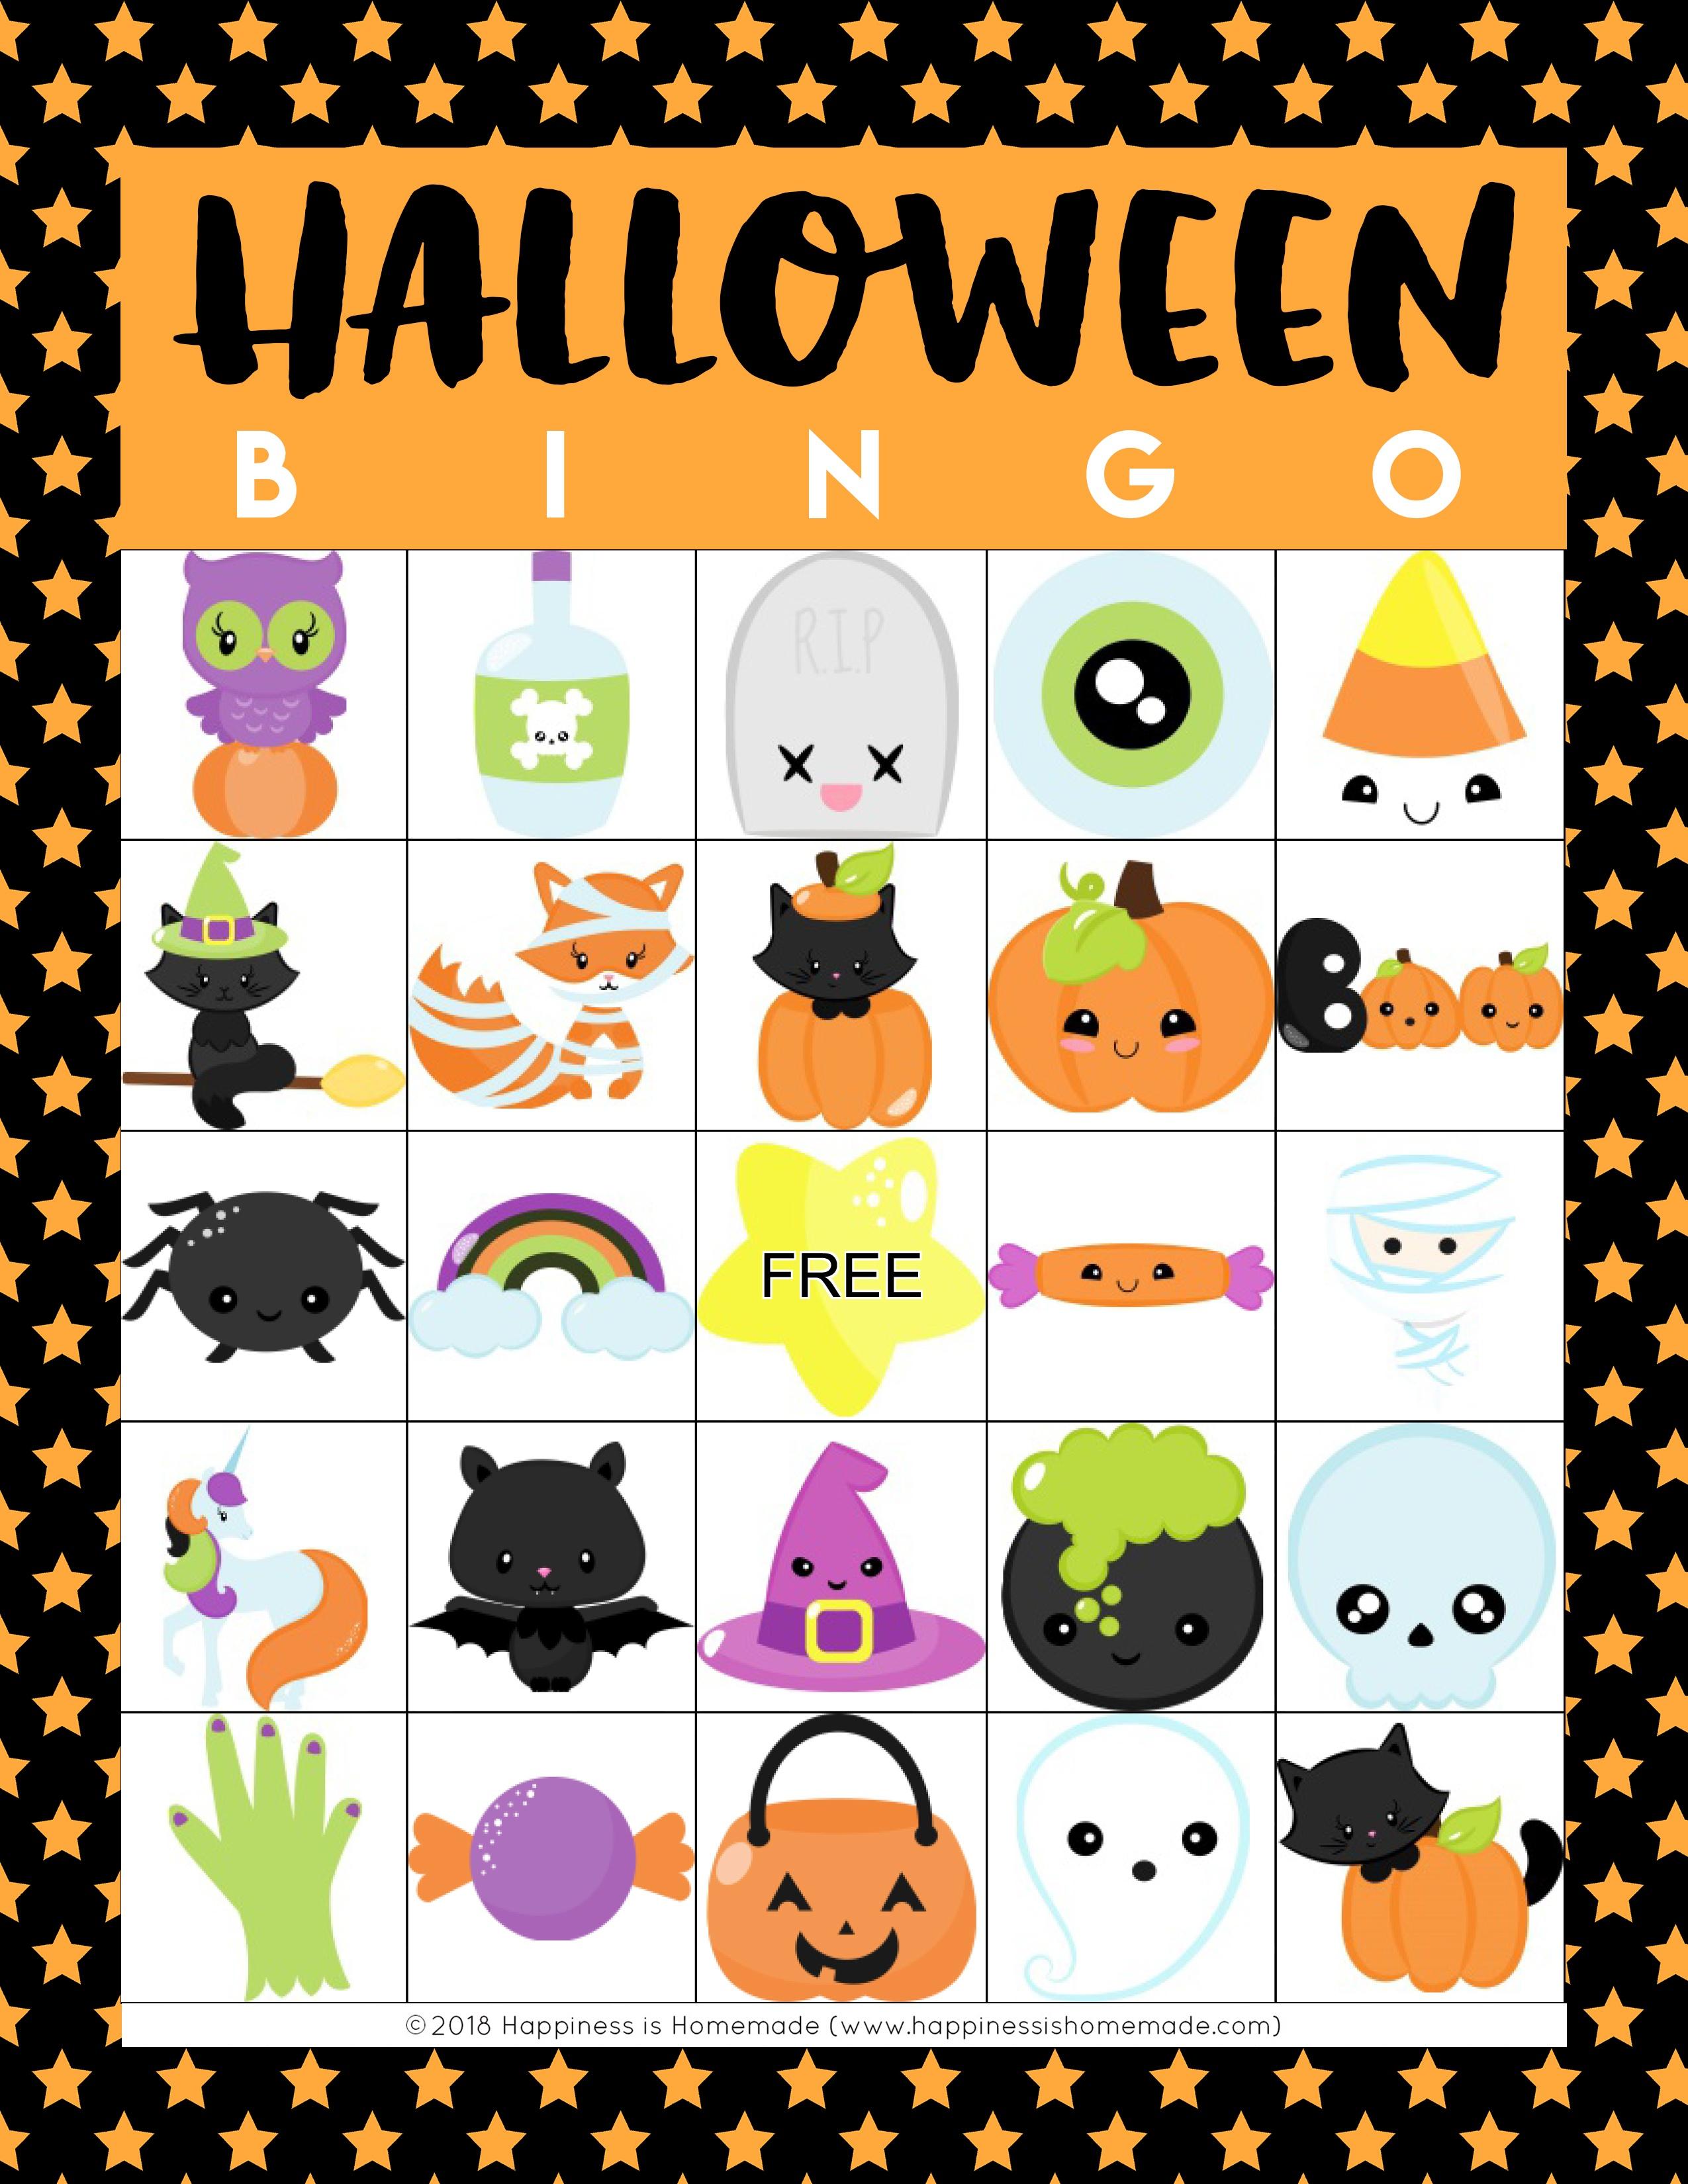 Printable Halloween Bingo Cards - Happiness Is Homemade - Free Printable Halloween Cards